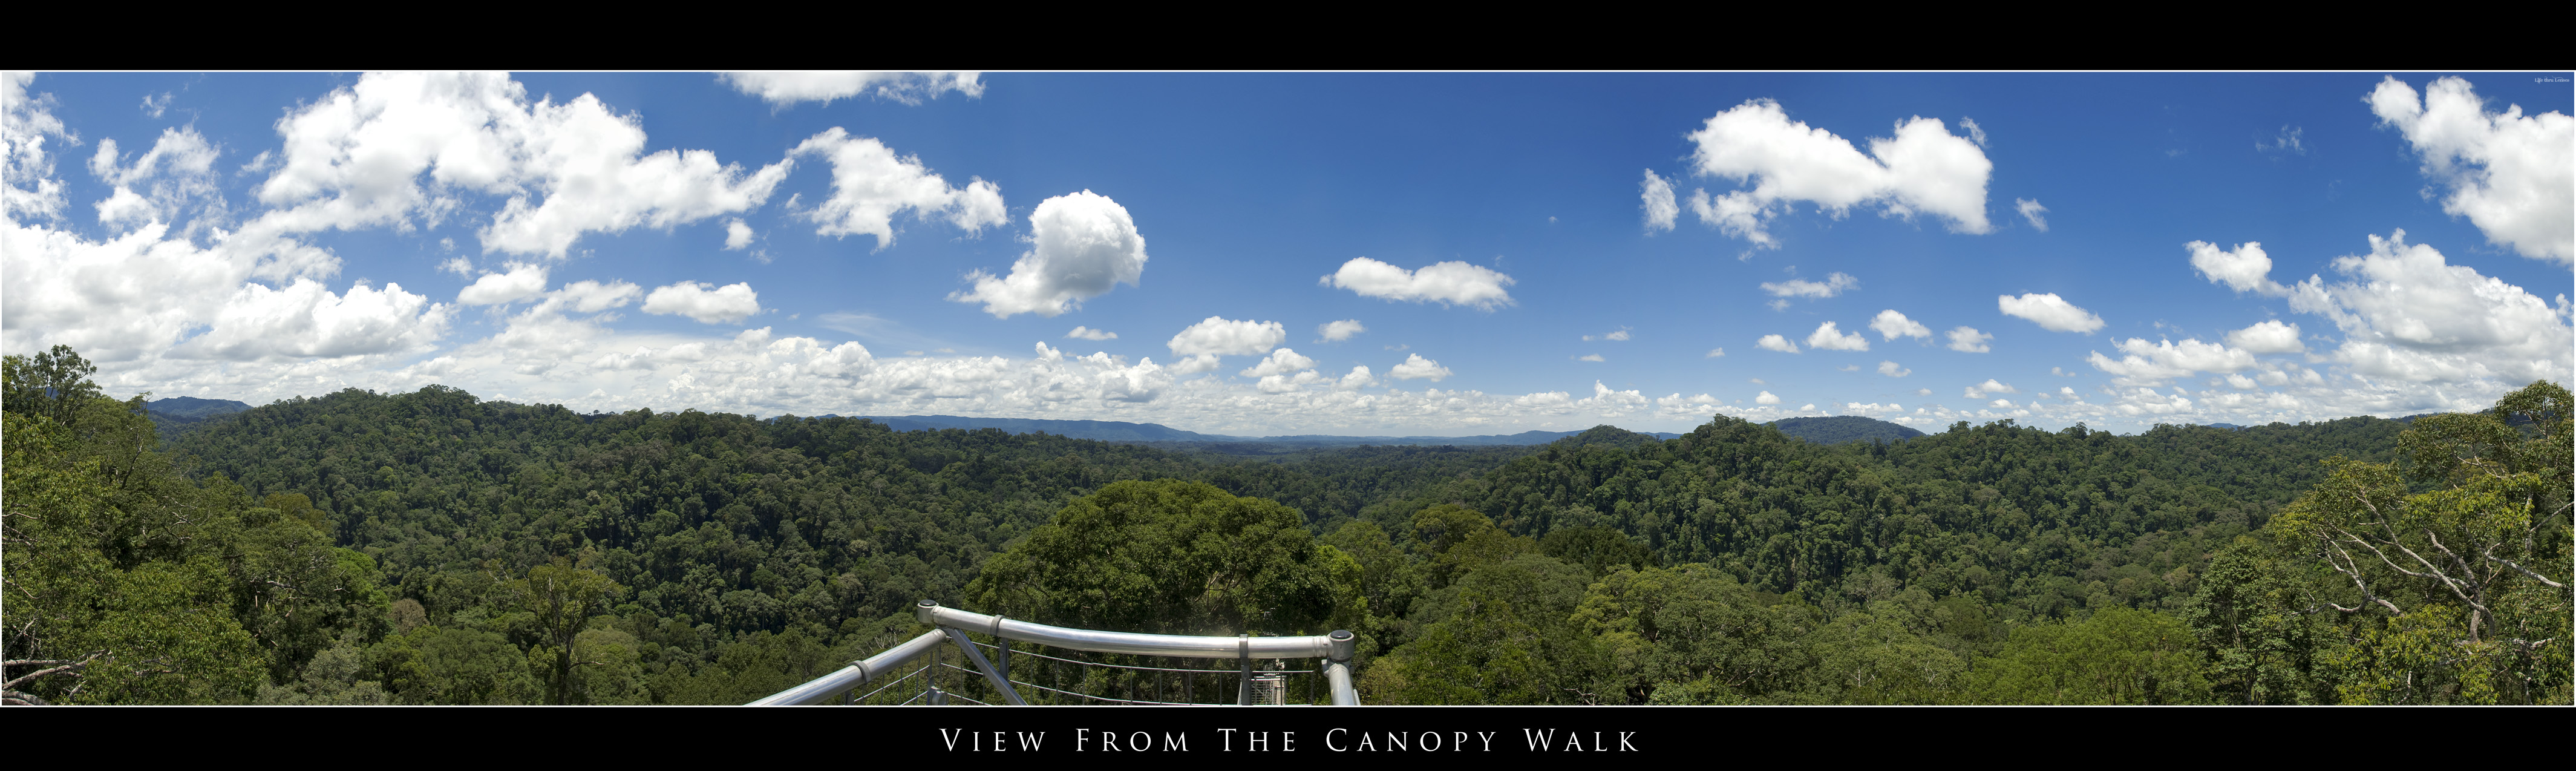 Canopy Walk Panorama